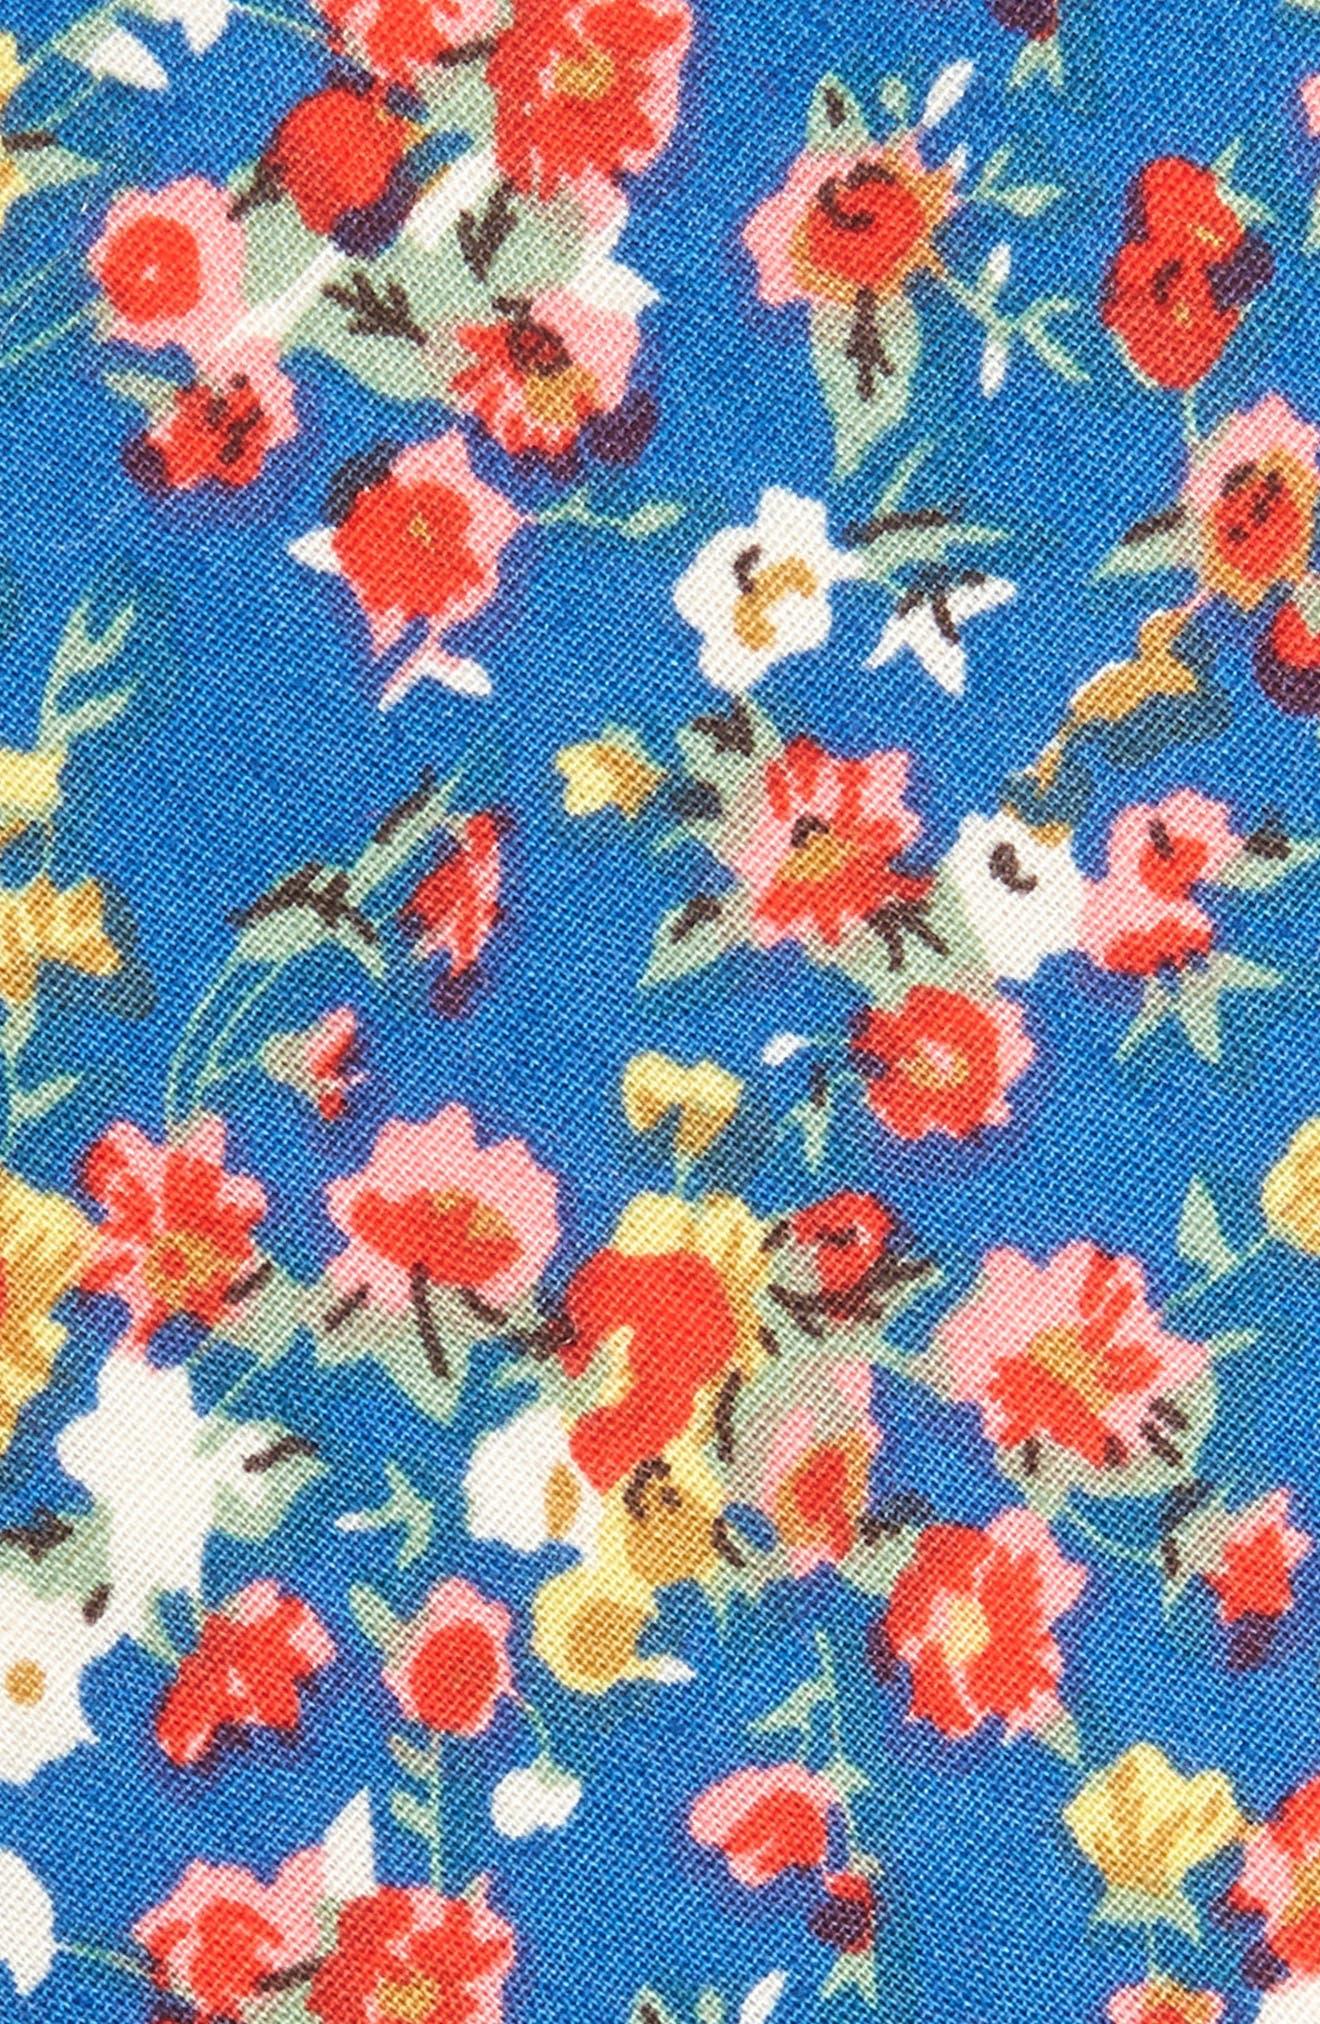 Ager Floral Cotton Tie,                             Alternate thumbnail 2, color,                             NAVY